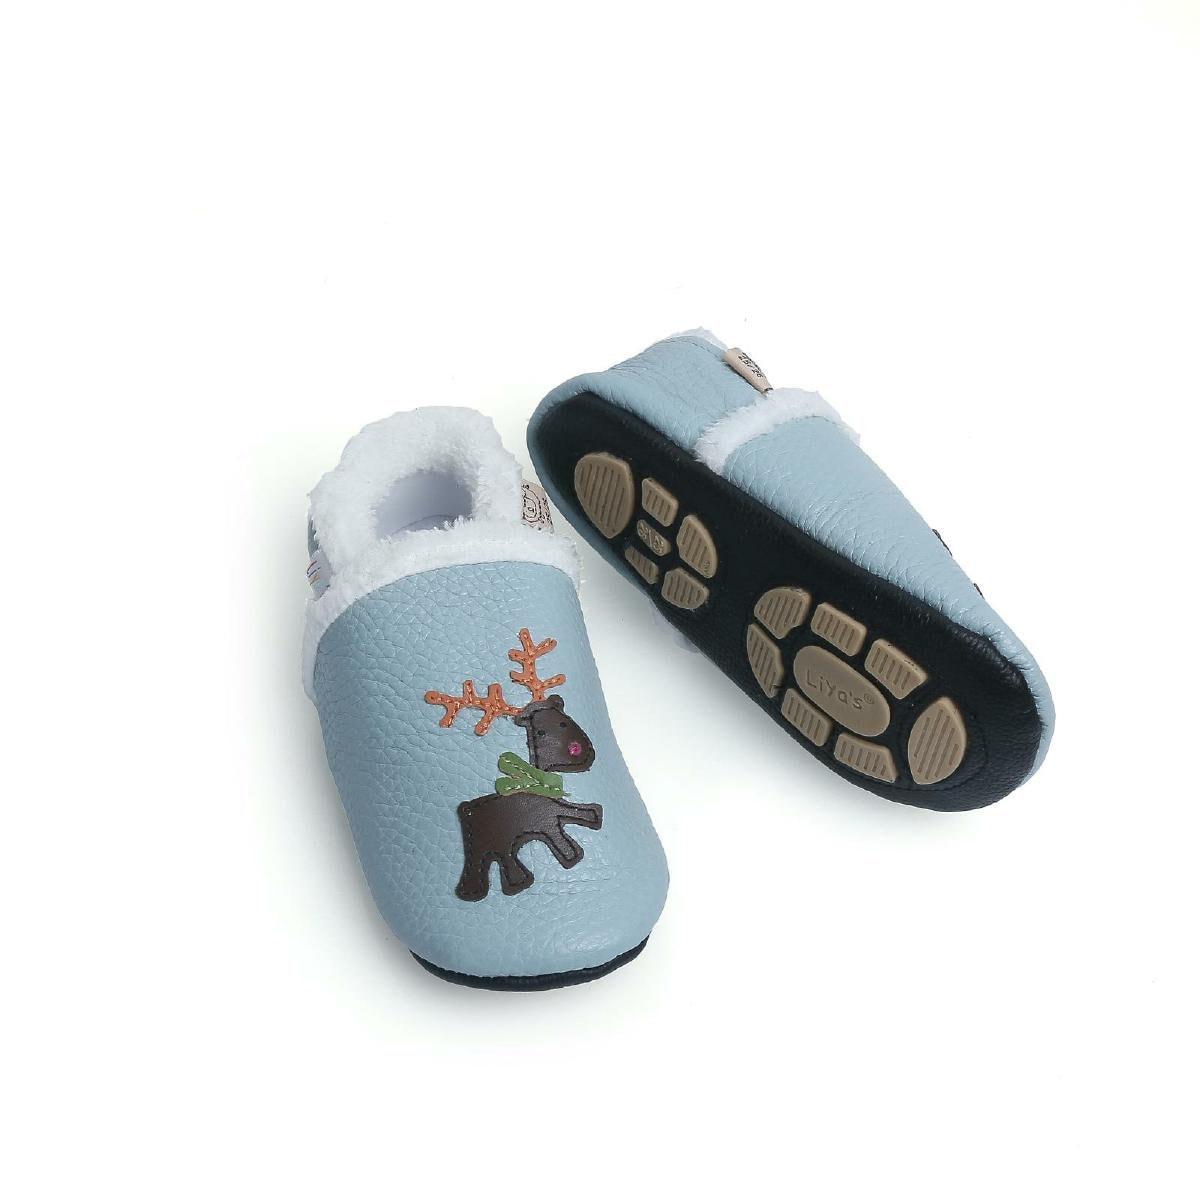 4e4b1dc41eeac3 Liya s winter slippers leather slippers 372 Moose